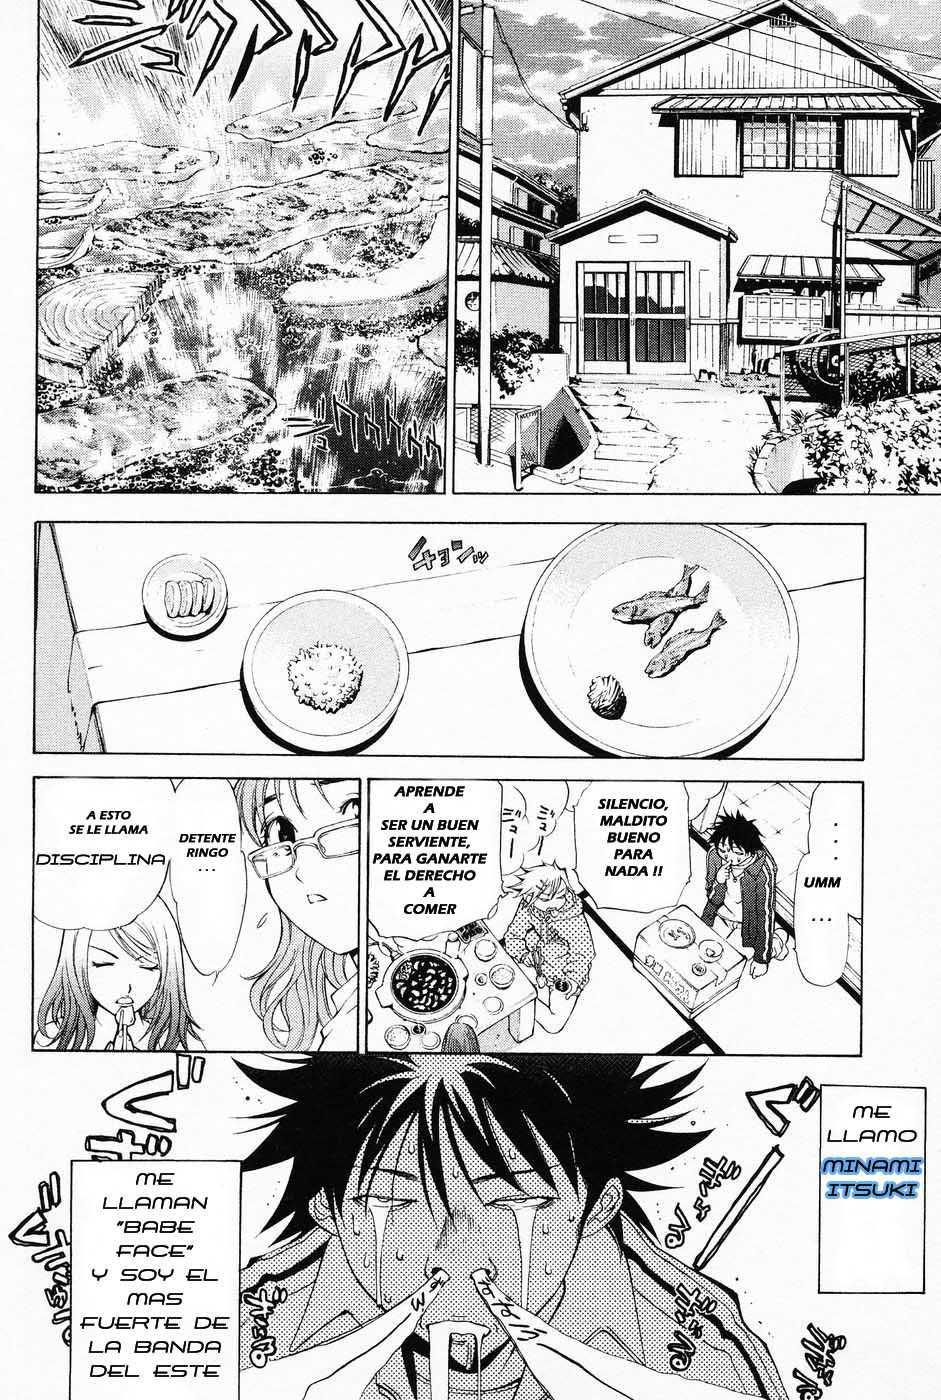 https://c5.ninemanga.com/es_manga/3/67/459683/c8cbd669cfb2f016574e9d147092b5bb.jpg Page 13